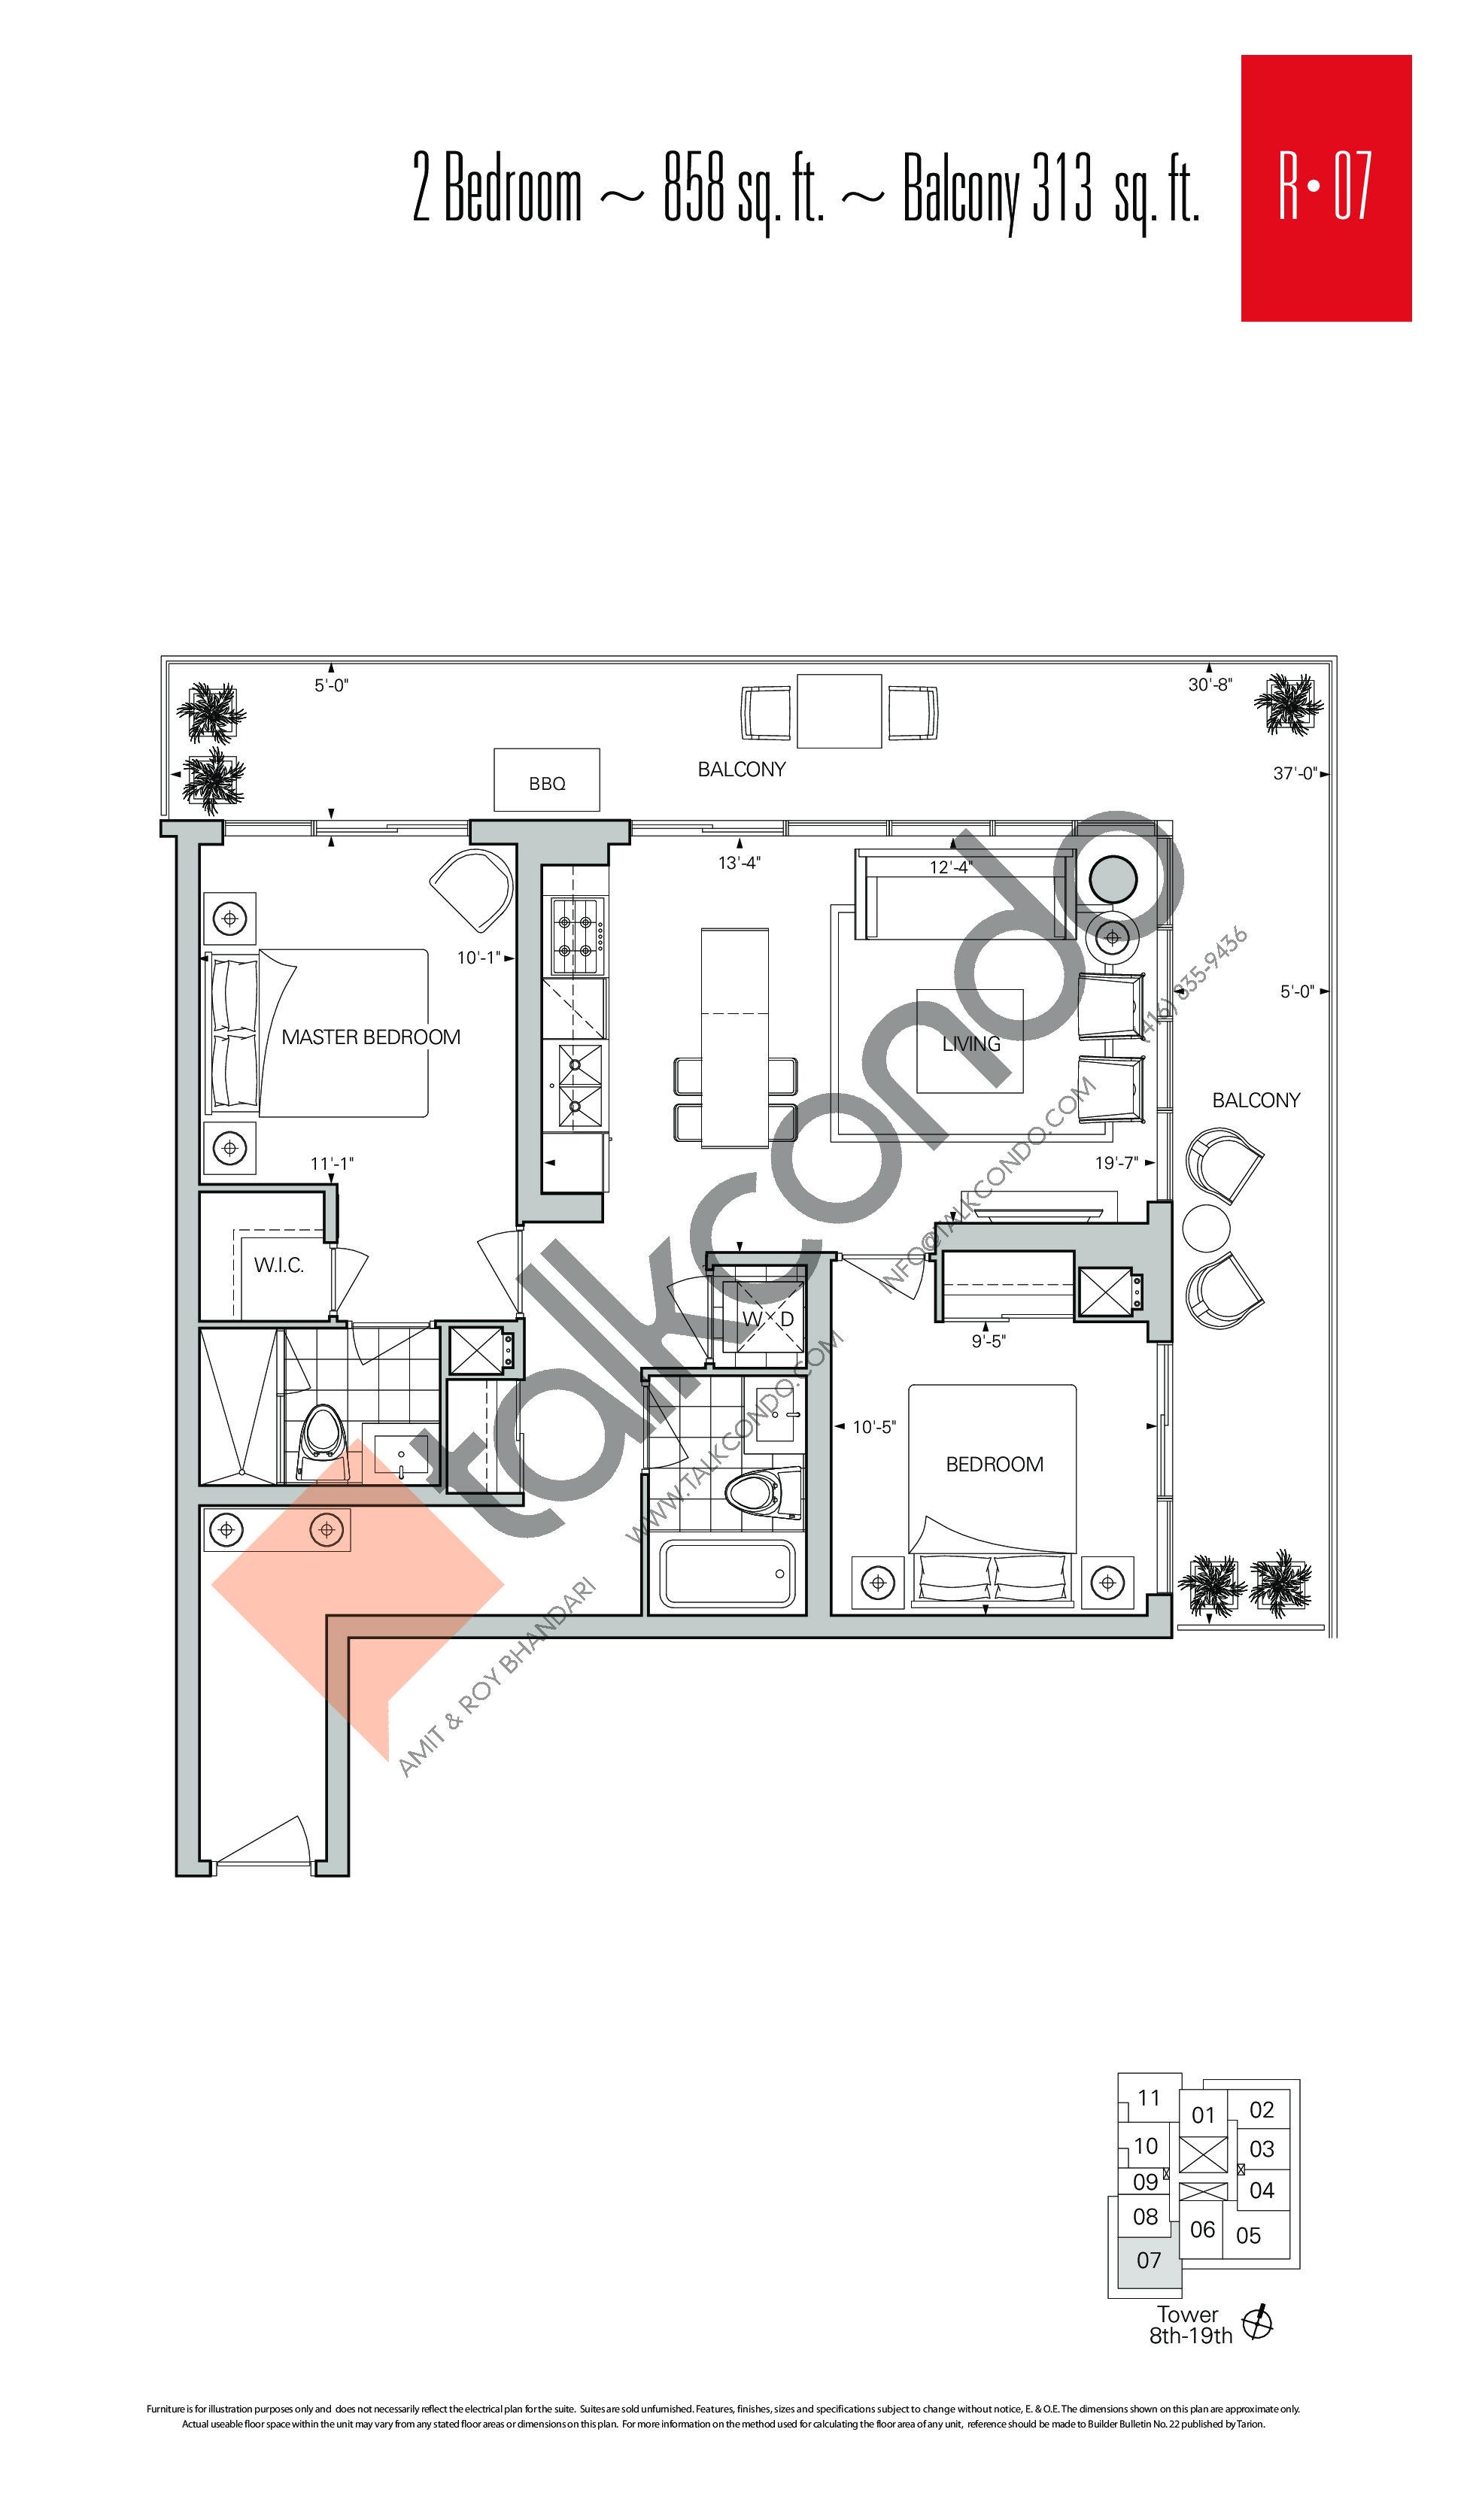 R-07 Floor Plan at Rise Condos - 858 sq.ft